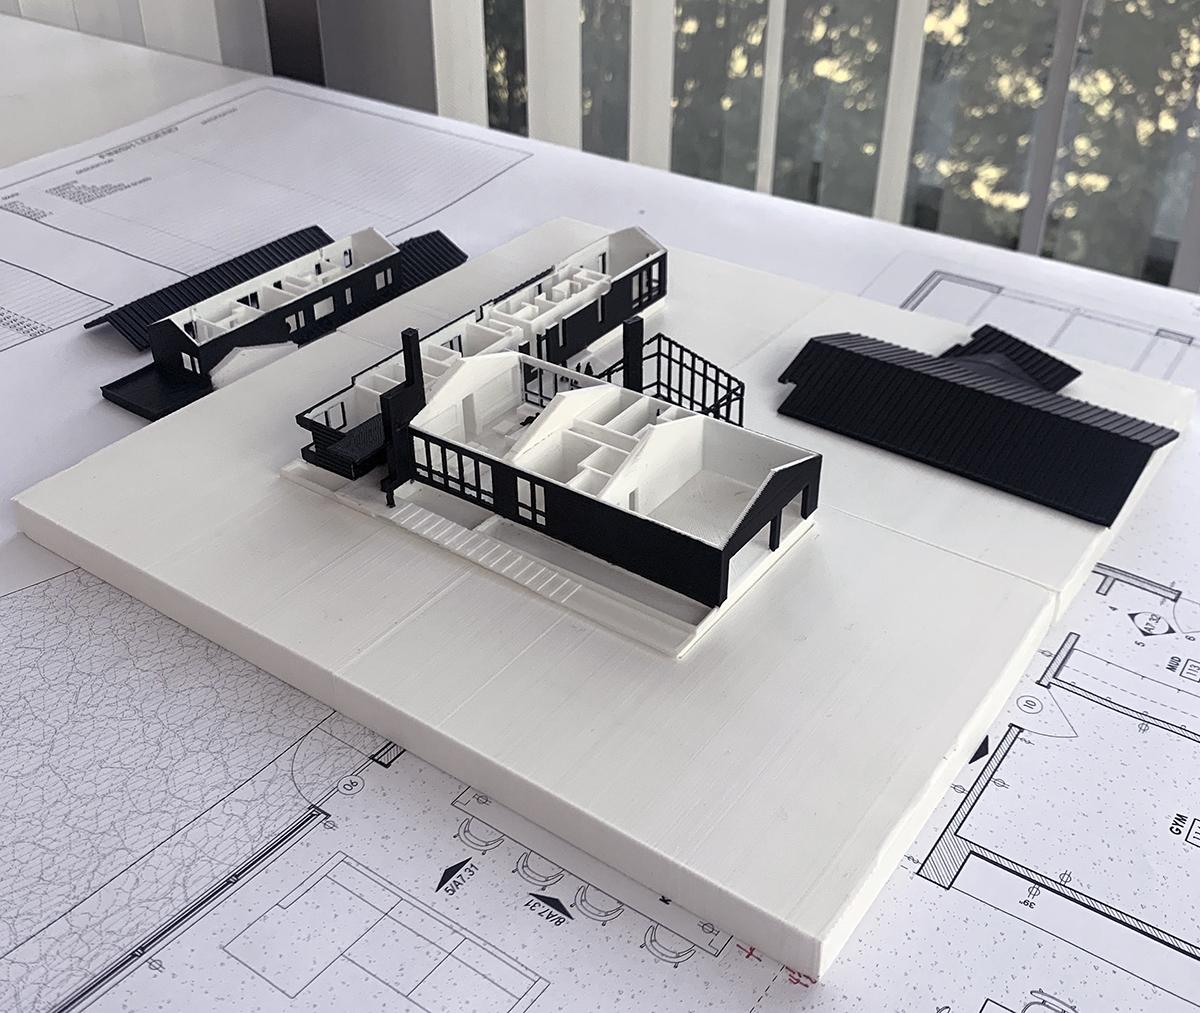 3D Model Disassembled - Printing Architectural 3D Models